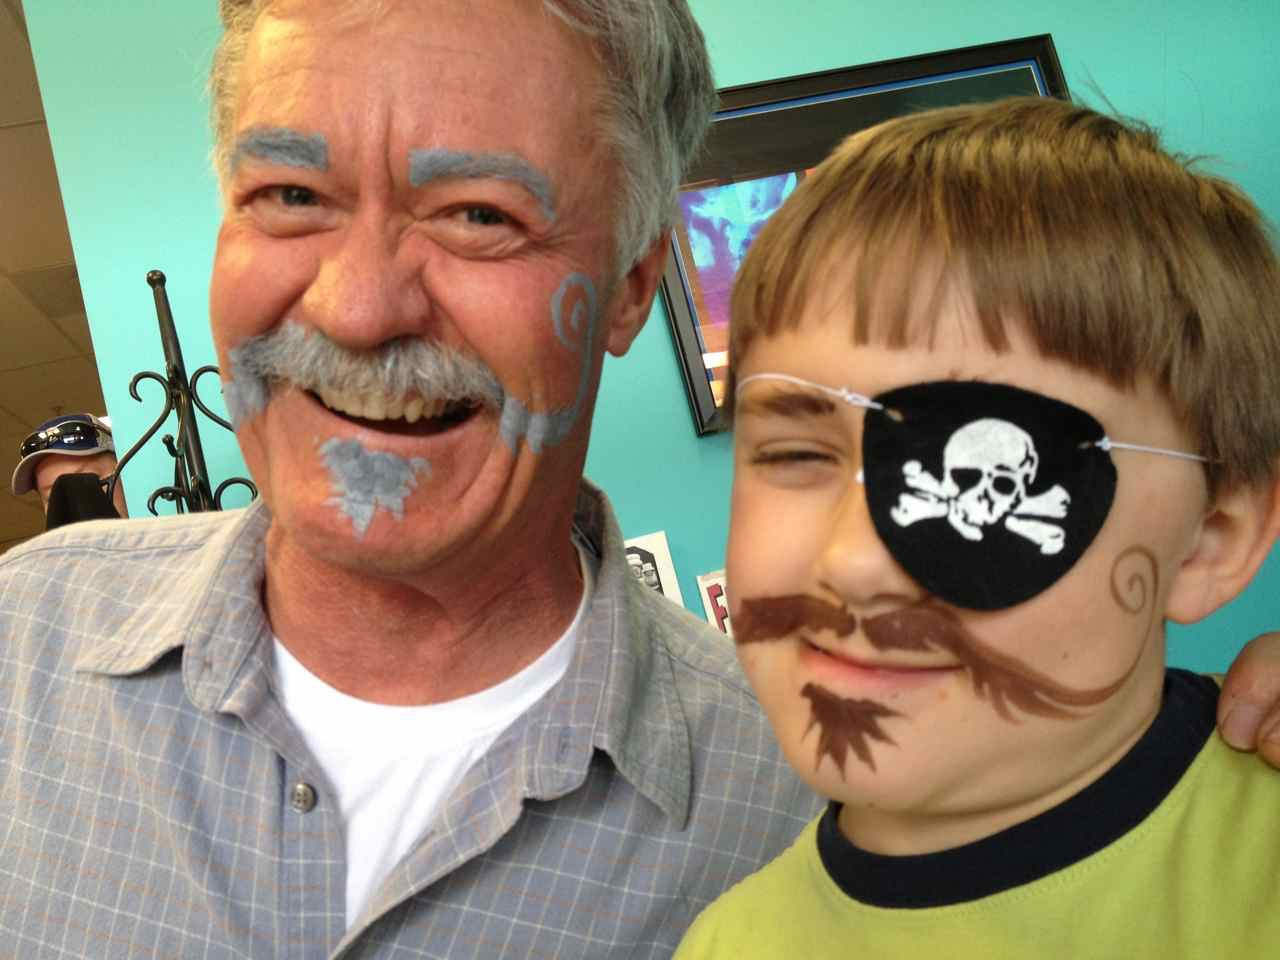 Grandpa and grandkid with pirate beards